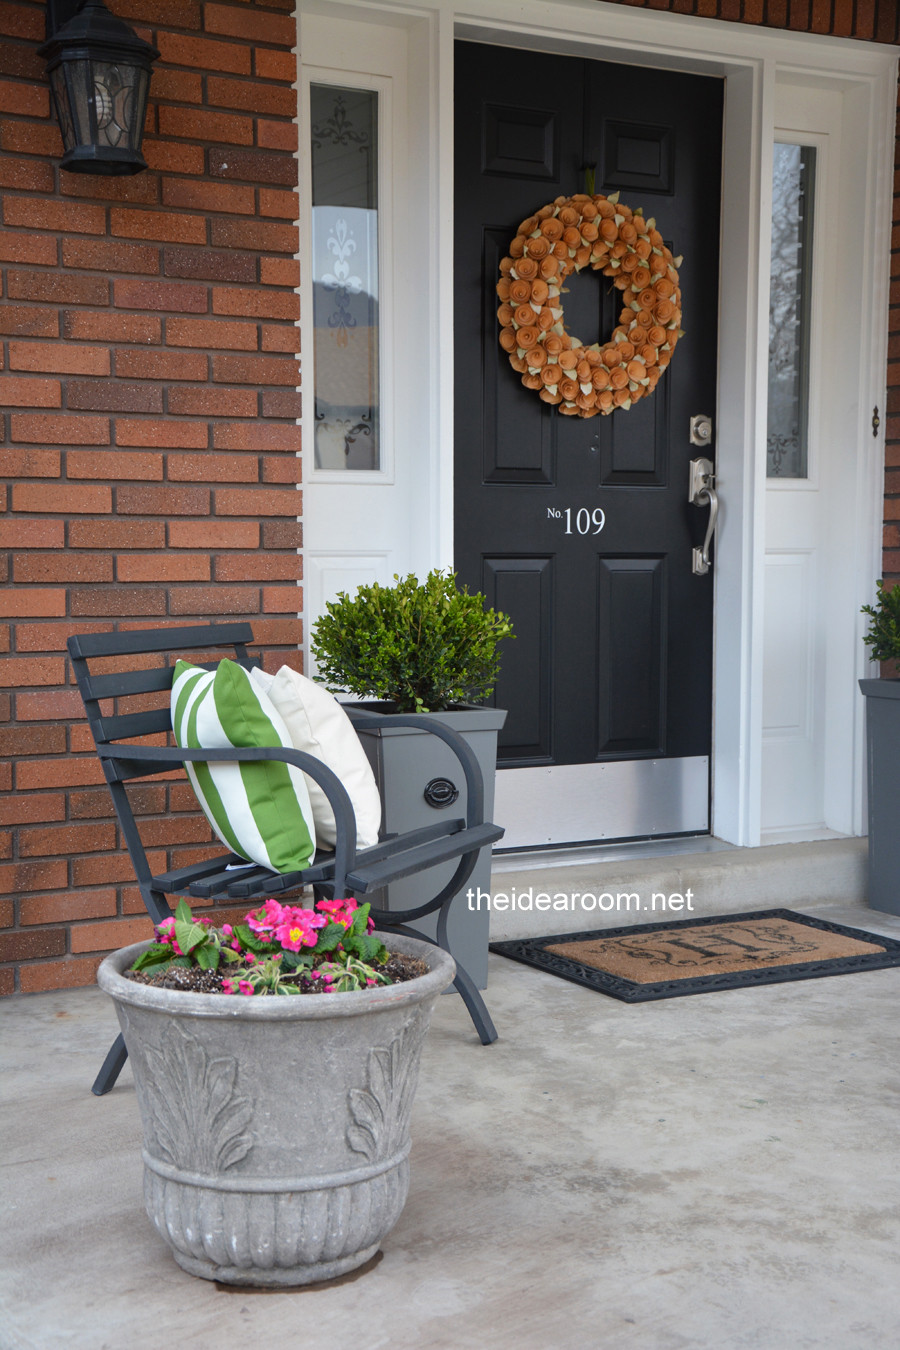 Best ideas about Front Porch Planter Ideas . Save or Pin DIY Porch Planter Now.